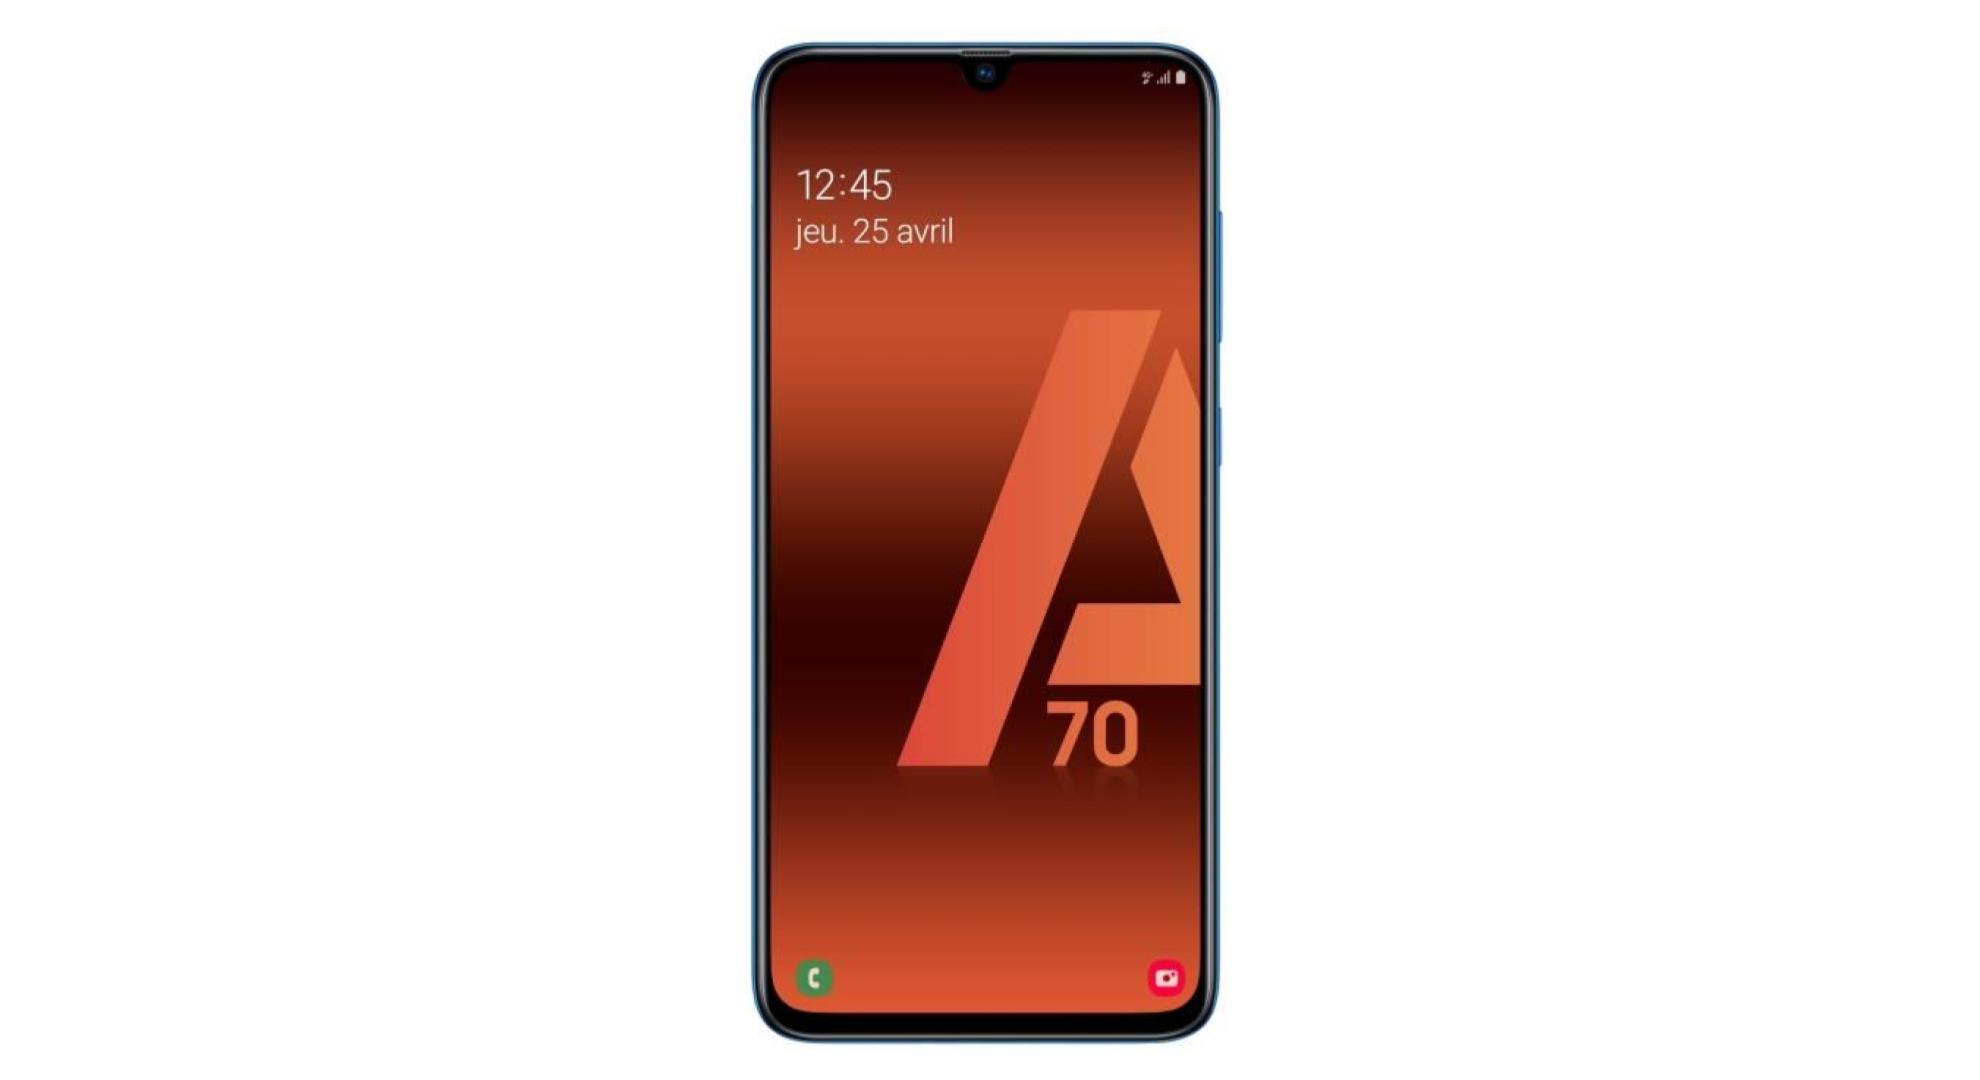 Où acheter le Samsung Galaxy A70 au meilleur prix en 2020 ?